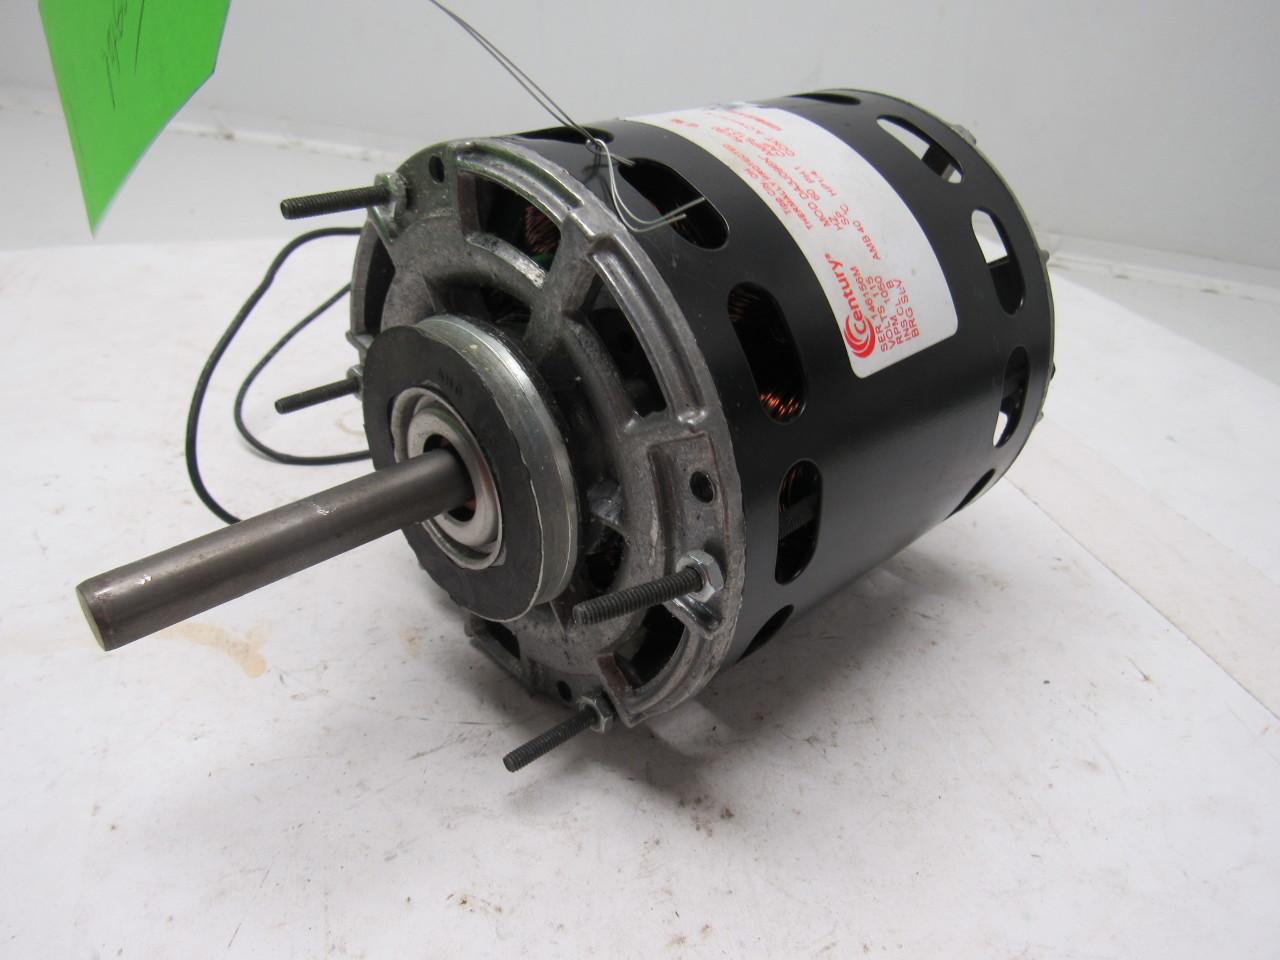 Century da3j096n 1 4 hp 115 v 1 ph 1050 rpm electric fan for 1 hp blower motor